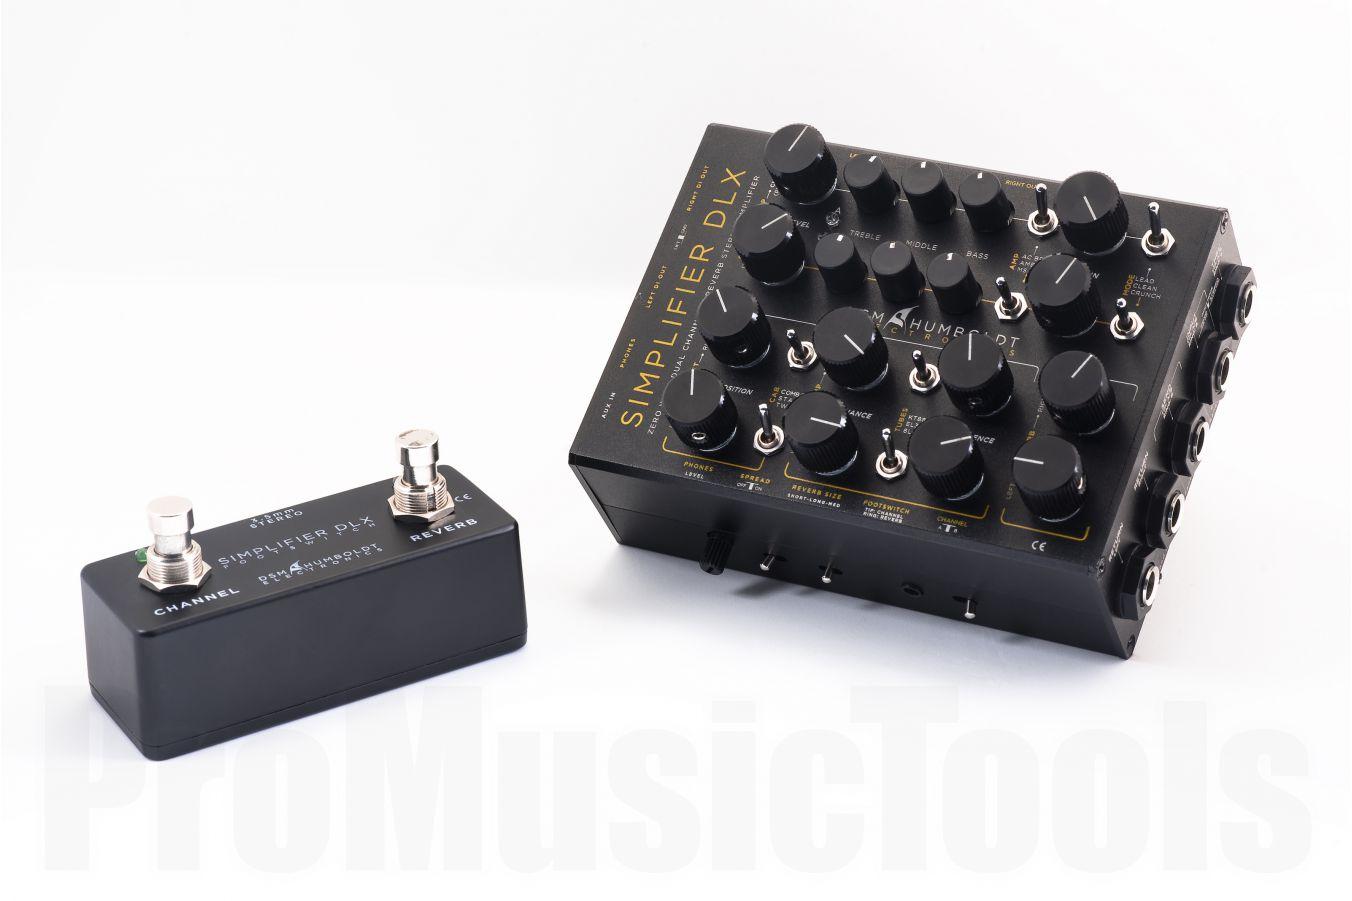 DSM & Humboldt Simplifier Deluxe - 0 Watt Dual-Channel Stereo Amplifier & Cab Simulator w/ Stereo Reverb